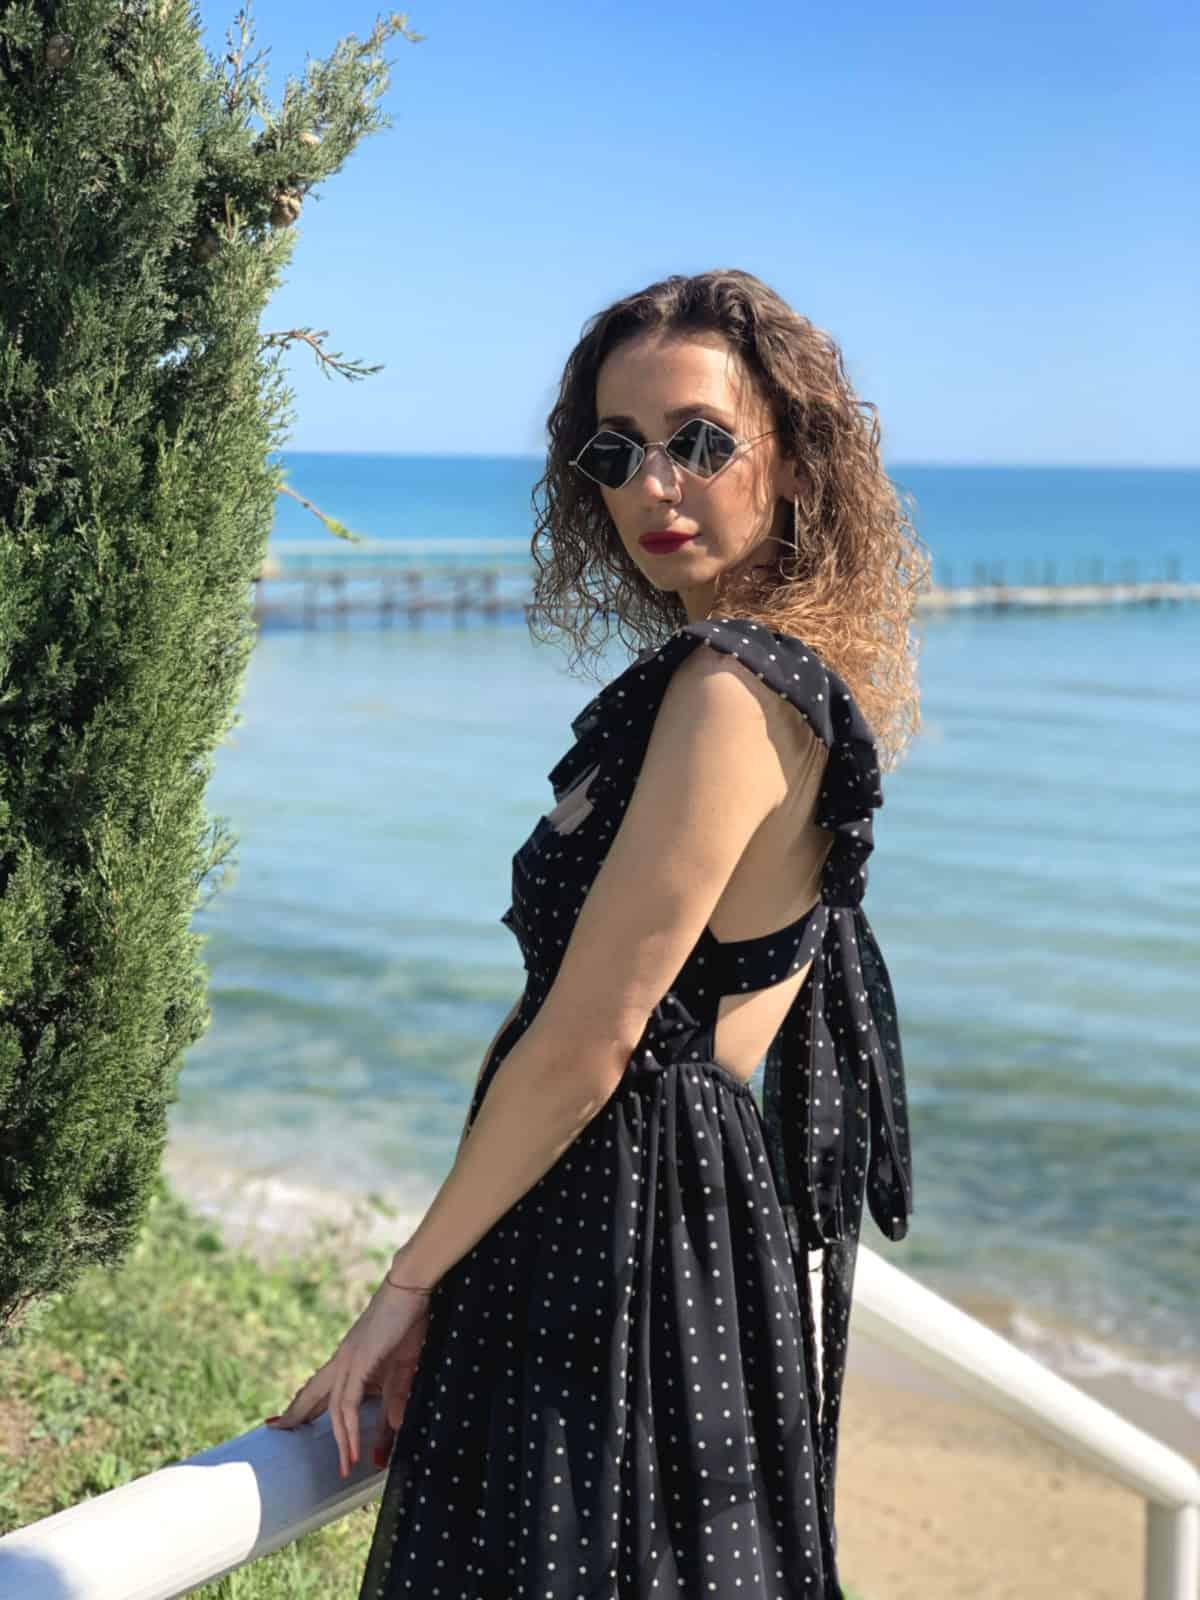 dylga-roklya-summer-na-tochki-limited-edition-3